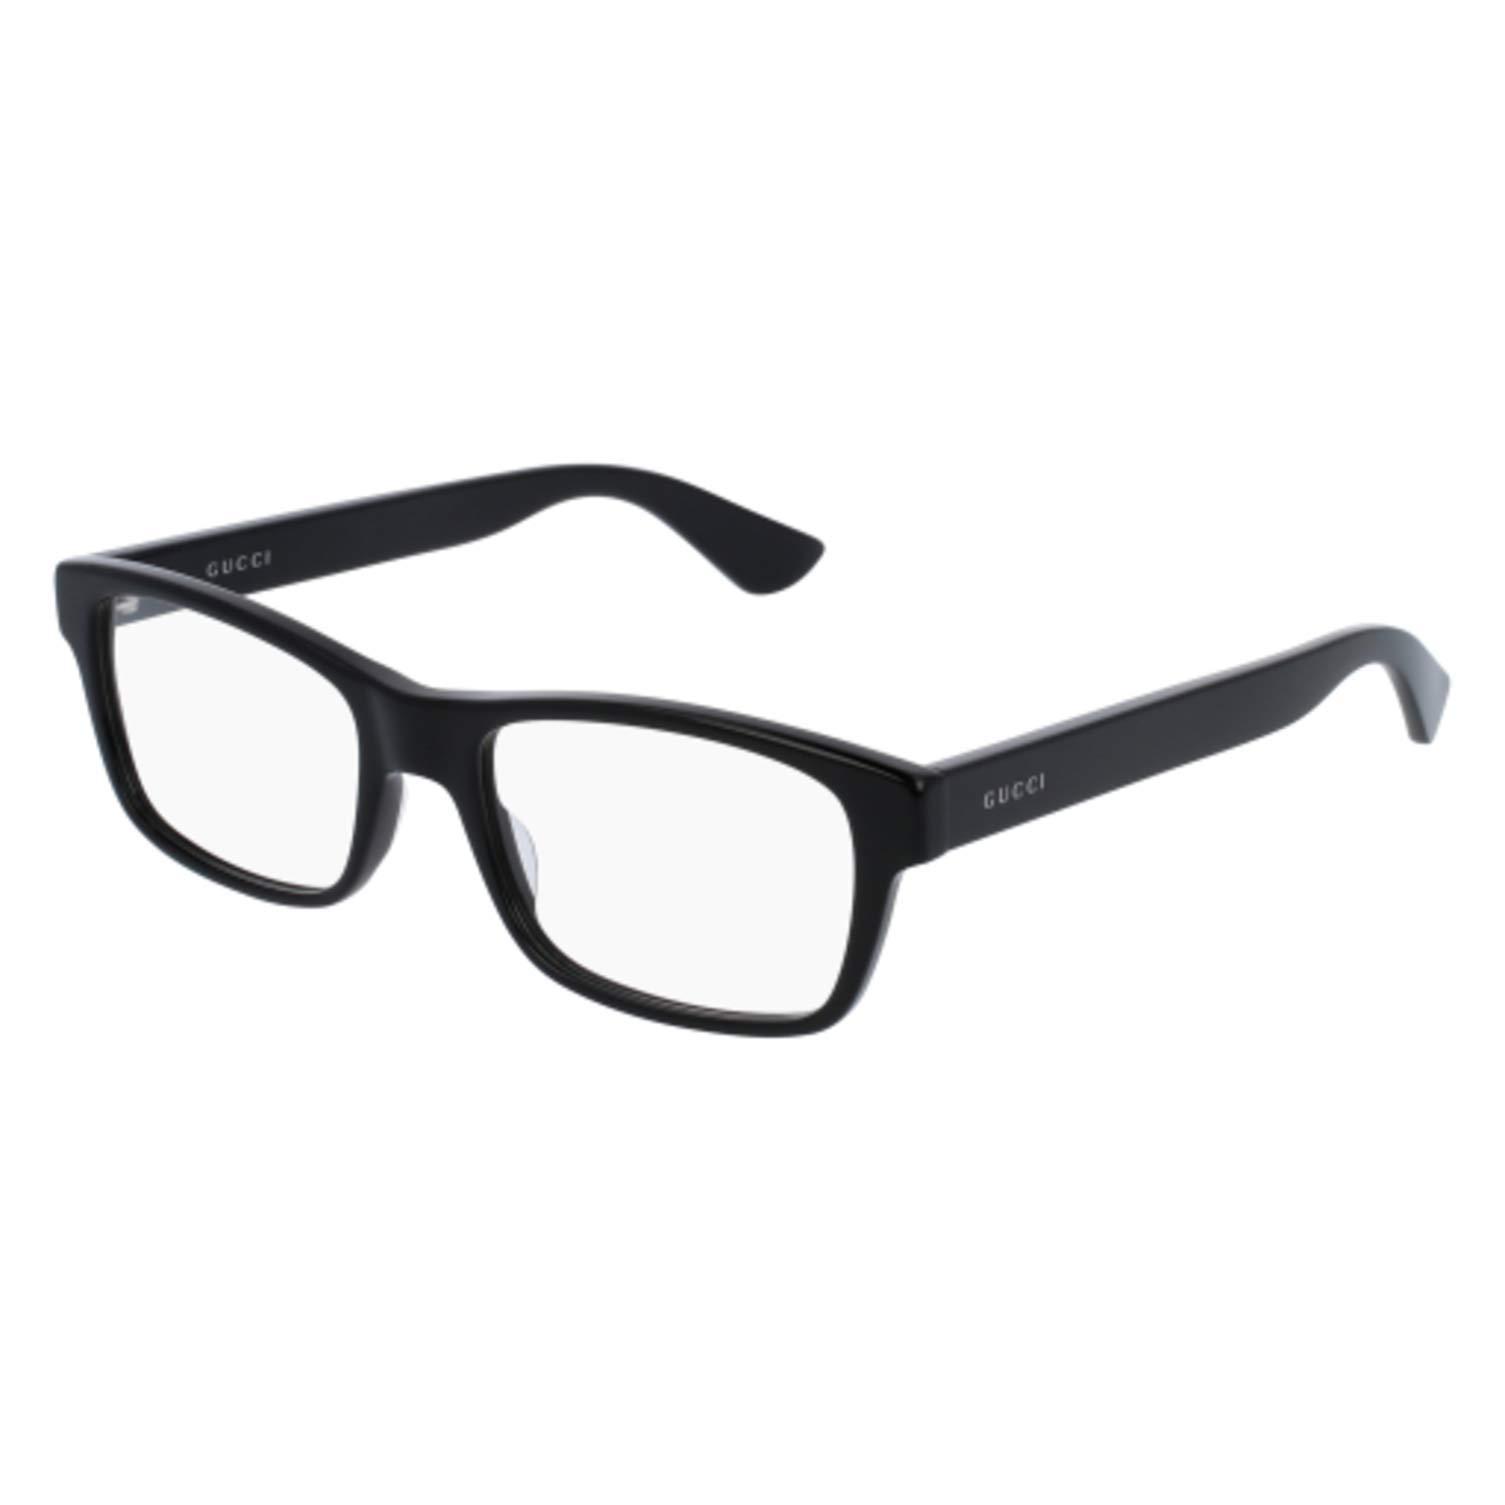 Gucci GG0006O Optical Frame 001 Black Black Transparent 53 mm